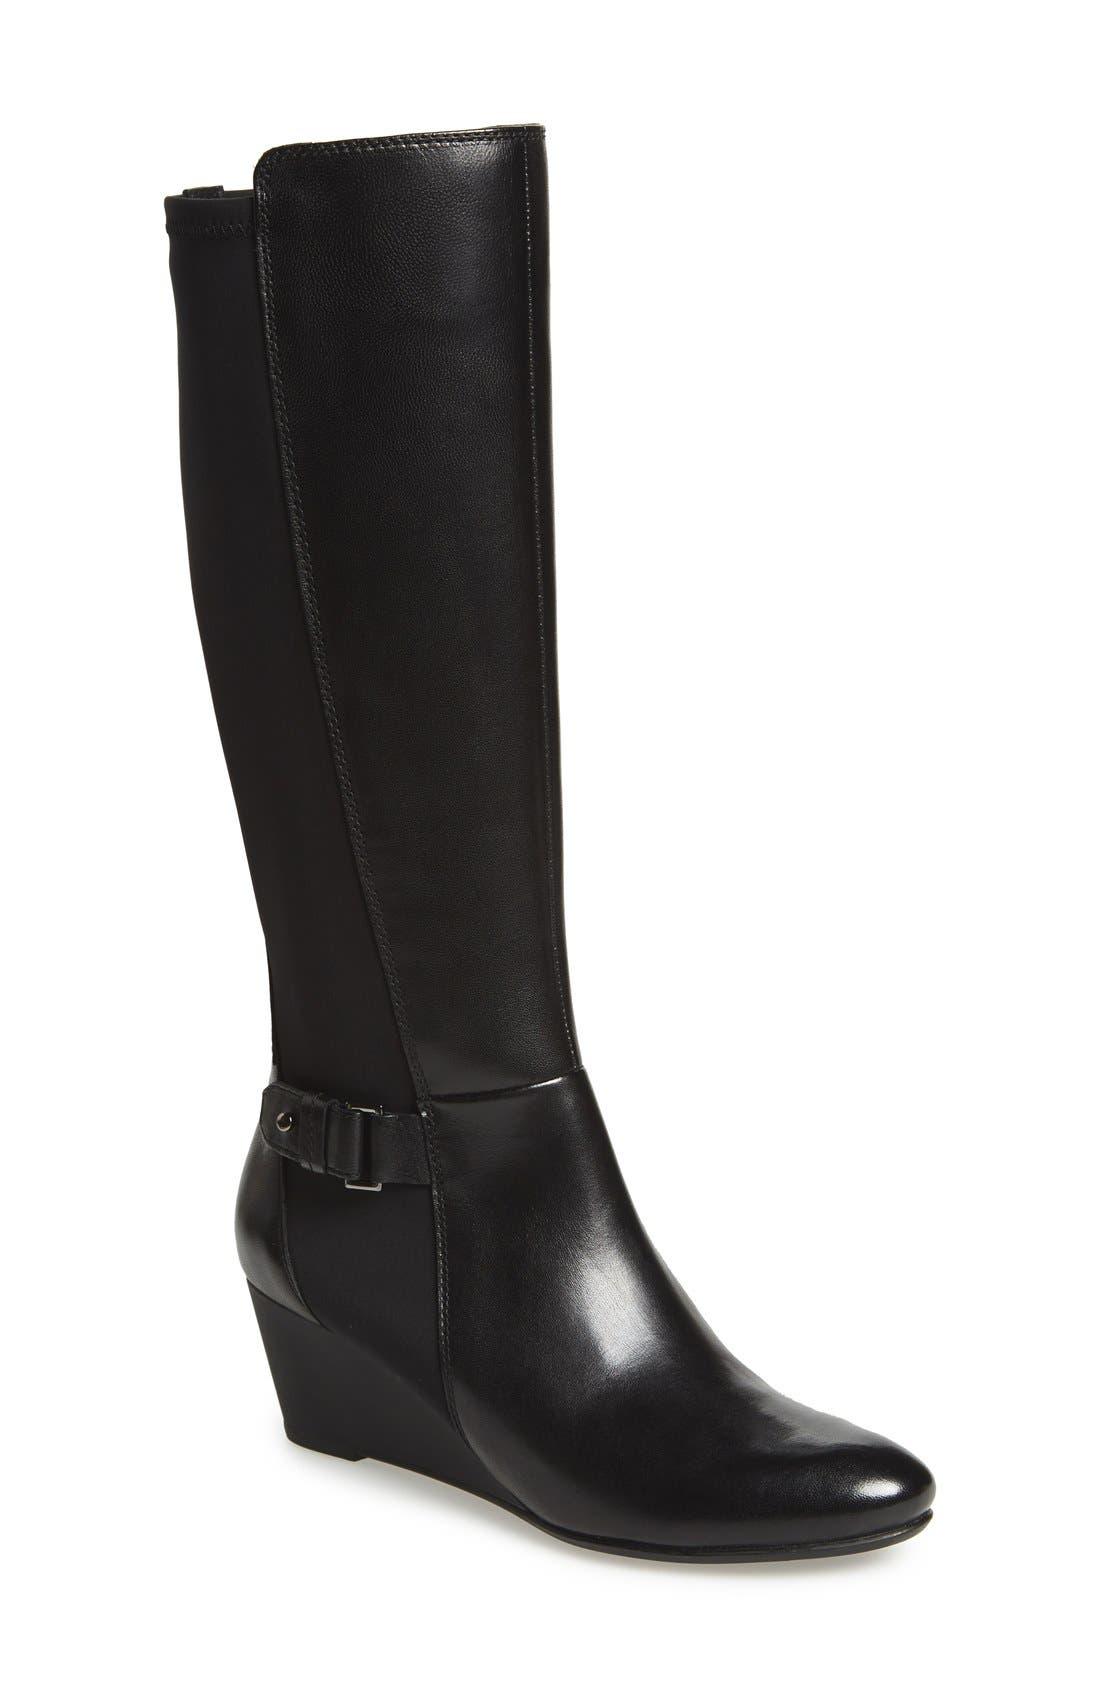 Main Image - Geox'Venere' Tall Wedge Boot (Women)